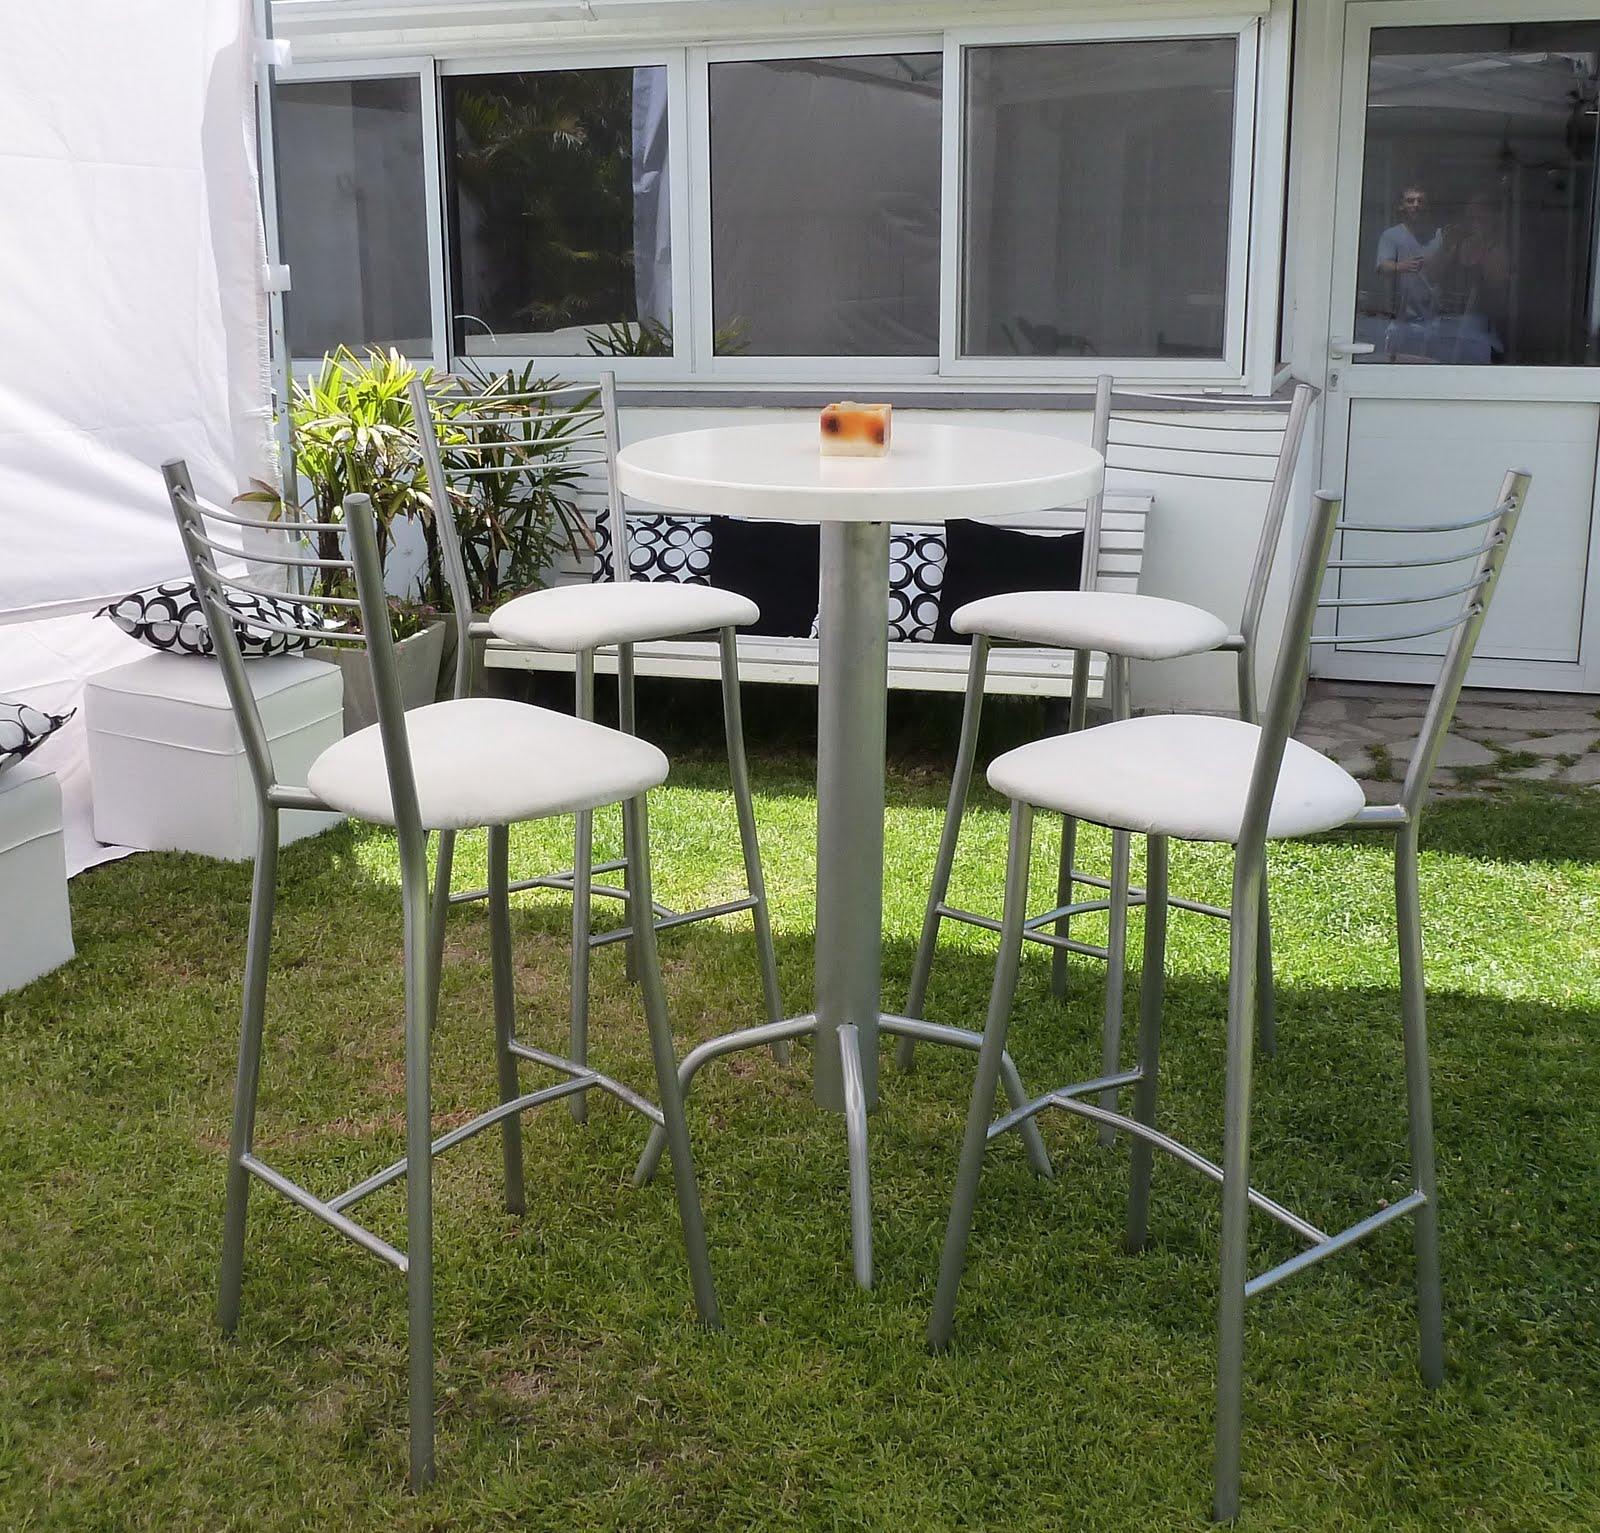 Tene tu living alquiler sillas y mesas altas para eventos - Alquiler sillas y mesas para eventos ...